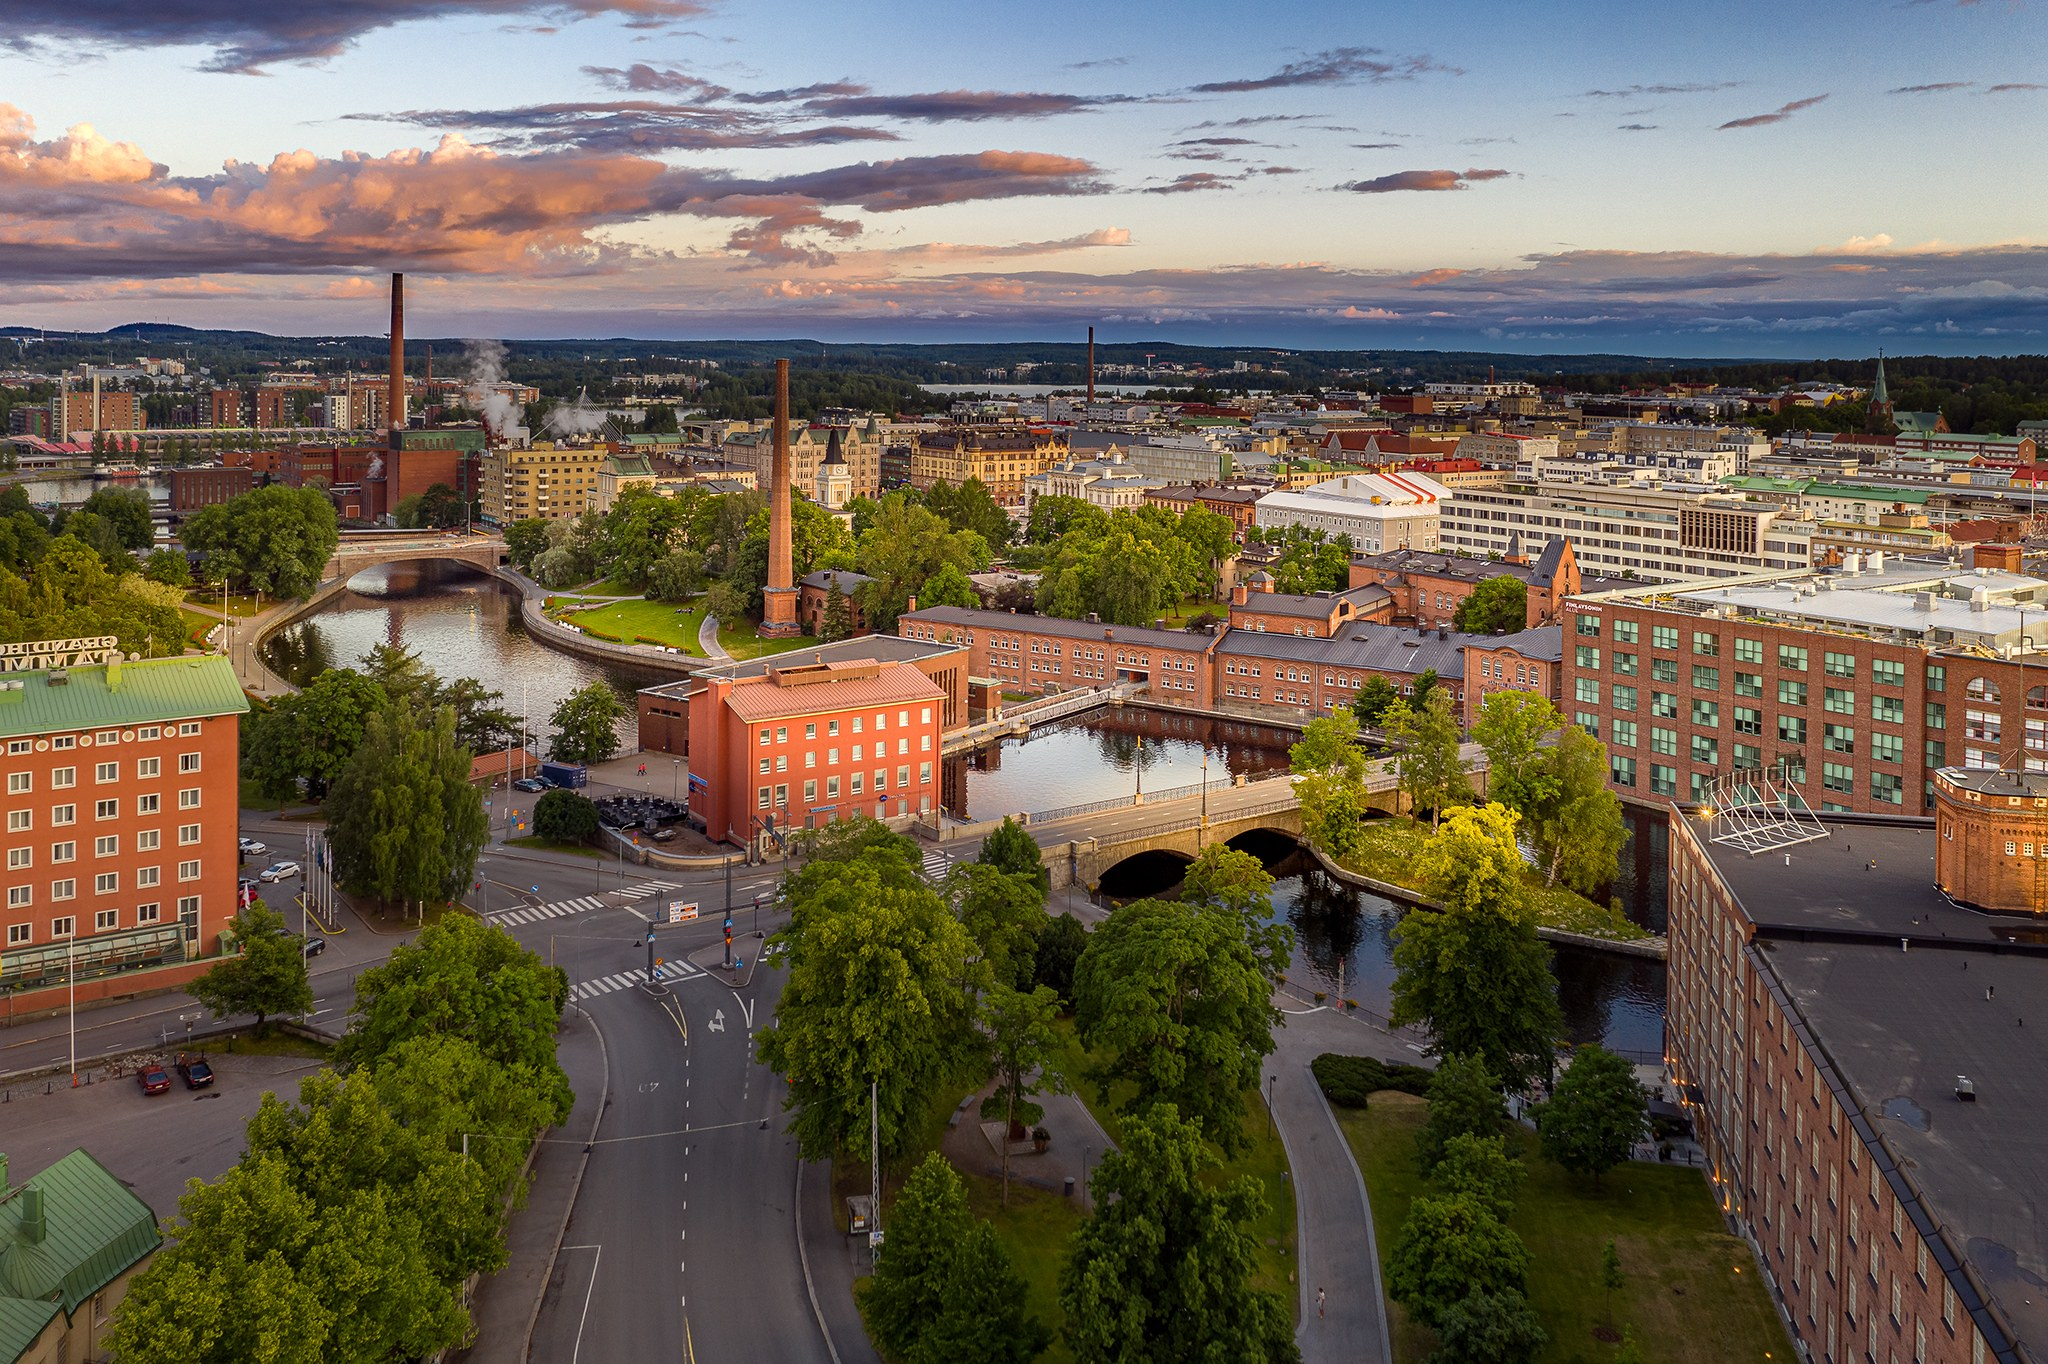 Visit Tampere Drone view Tammerkoski DJI 0041 Skyfox Marko Kallio